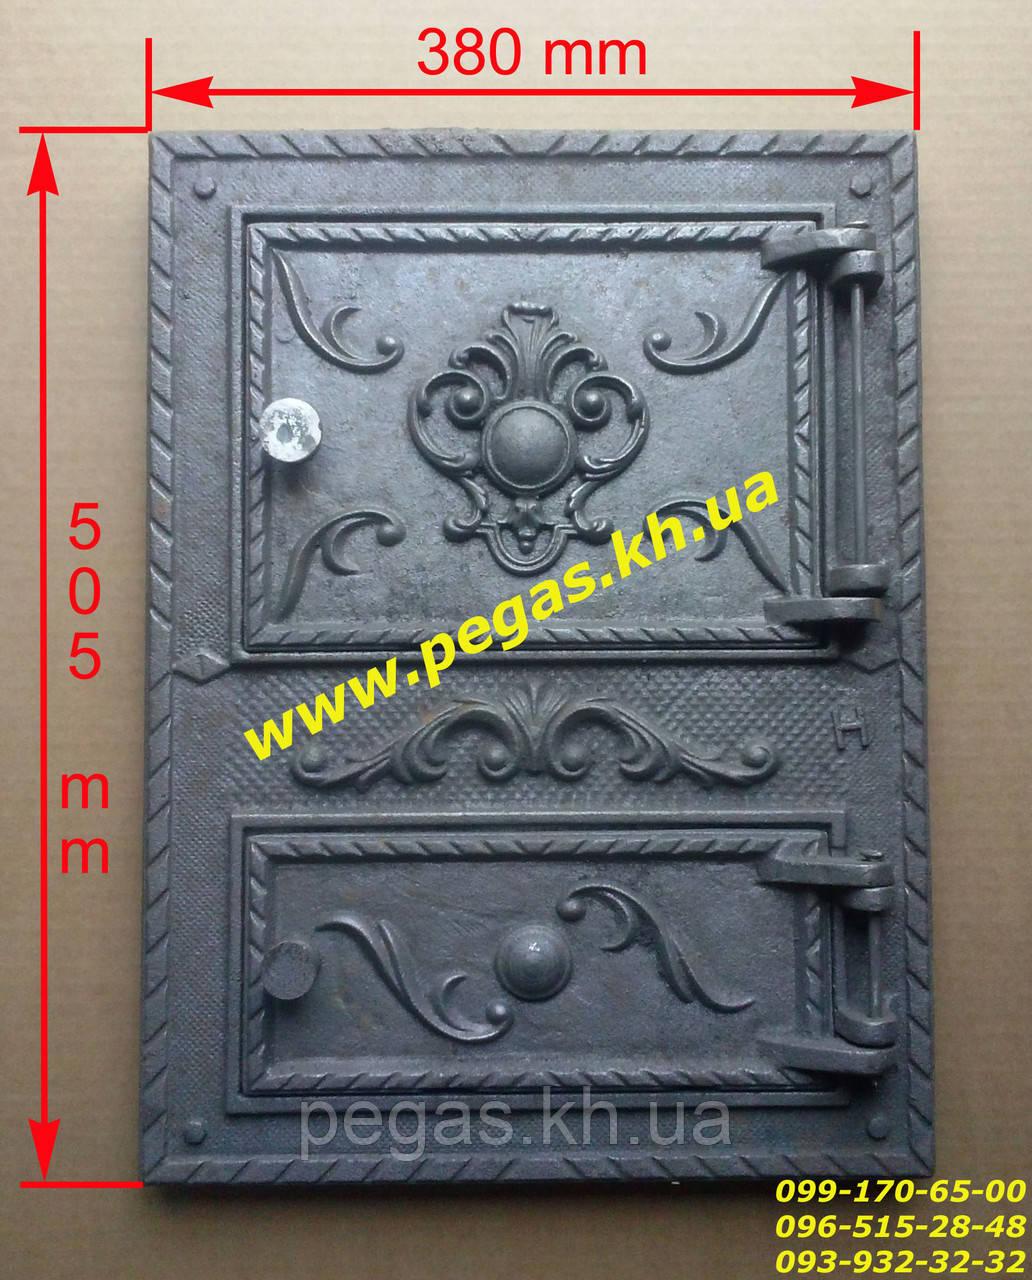 Дверка чугунная (Румыния №4) барбекю, грубу, печи, мангал